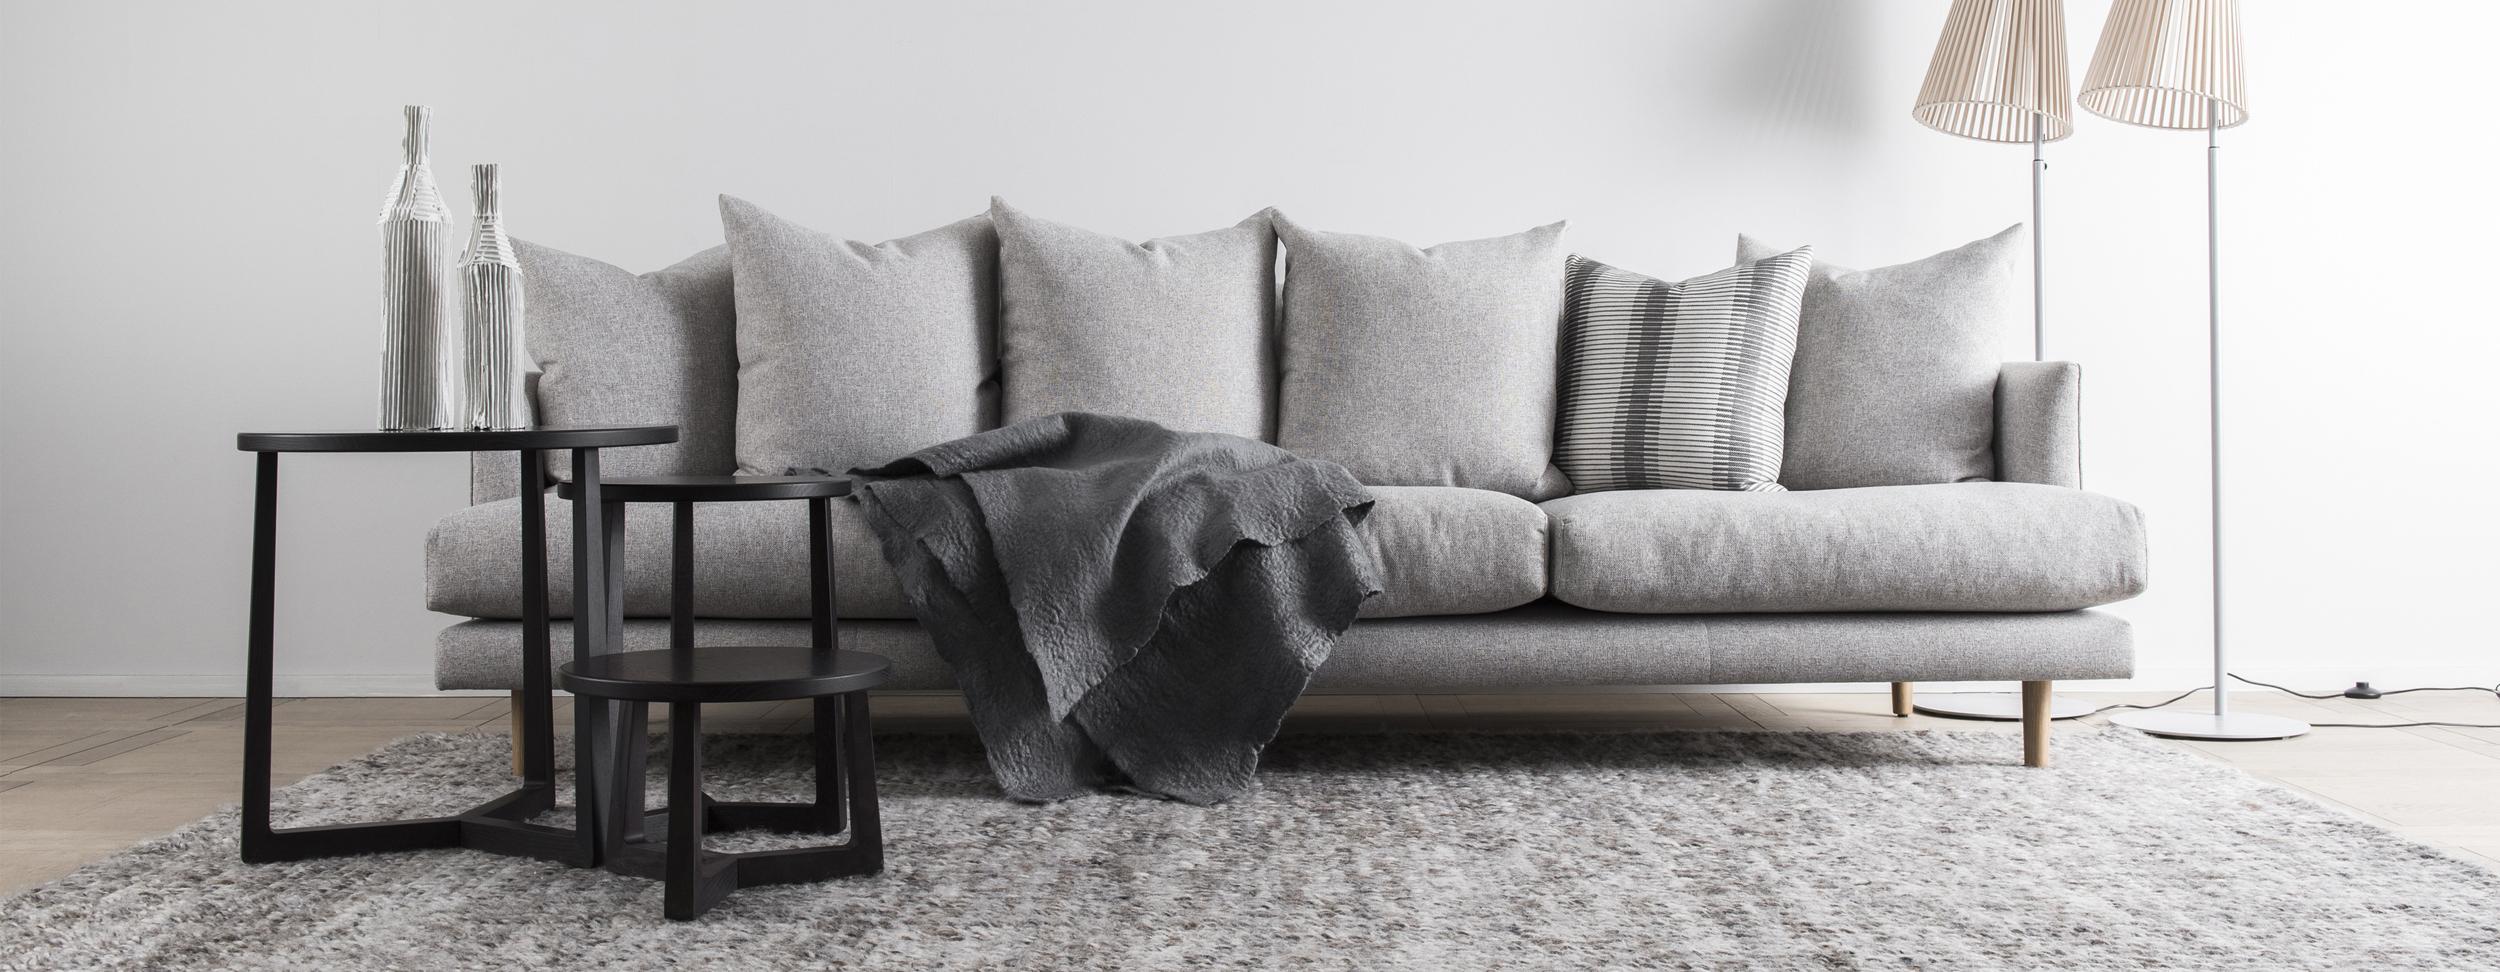 australian made sofa beds adelaide comfort dreams memory foam sleeper mattress designer sofas sydney melbourne fanuli furniture